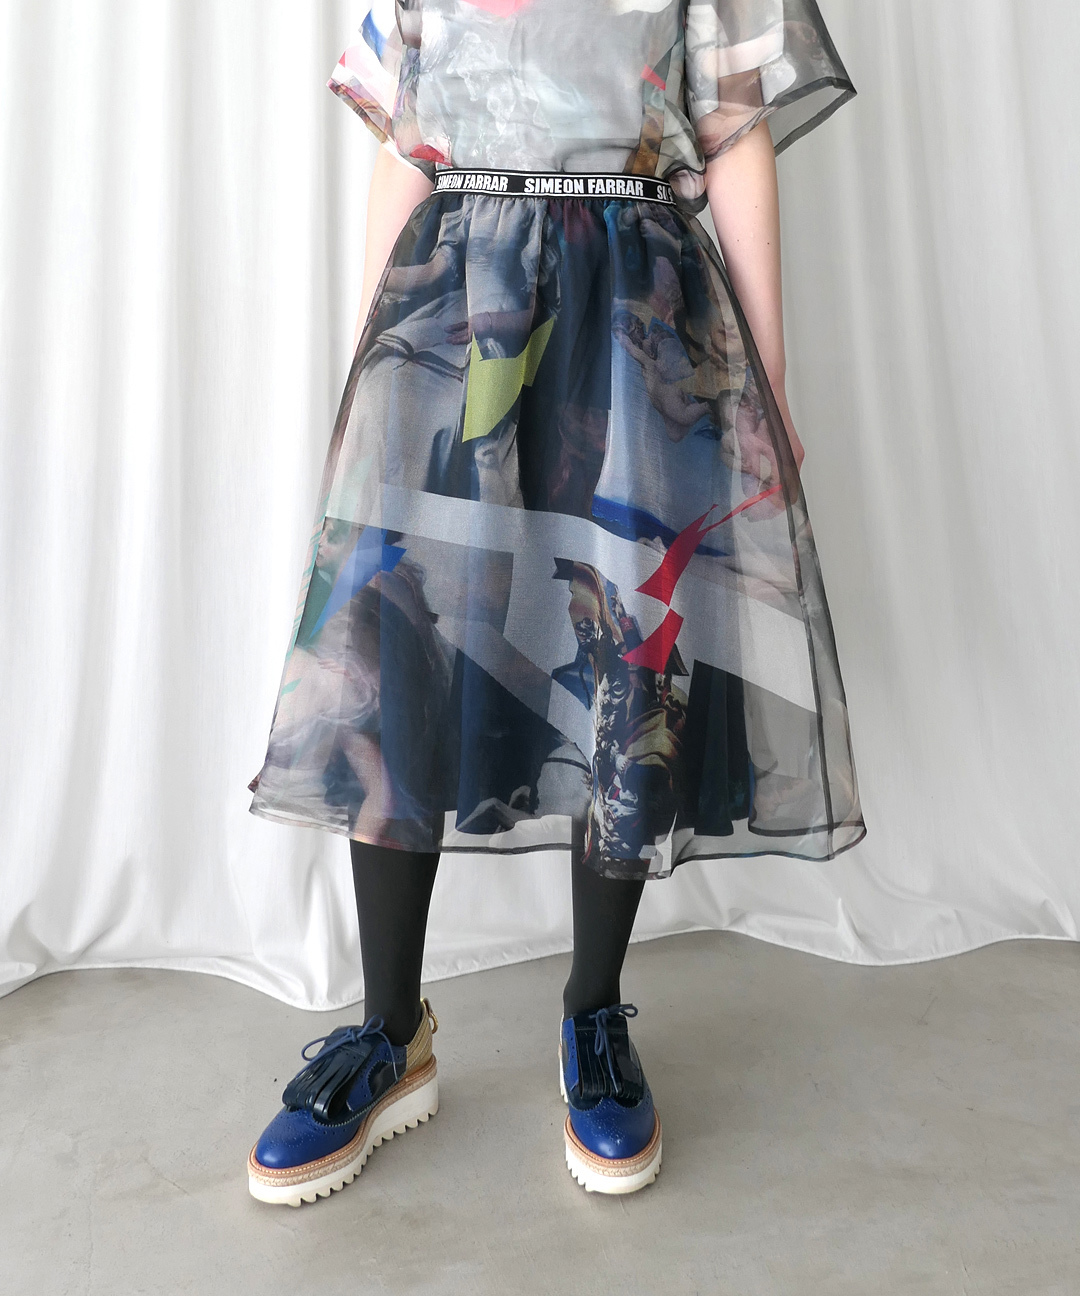 SIMEON FARRAR 春夏コレクション入荷のお知らせ_c0176078_19114713.jpg